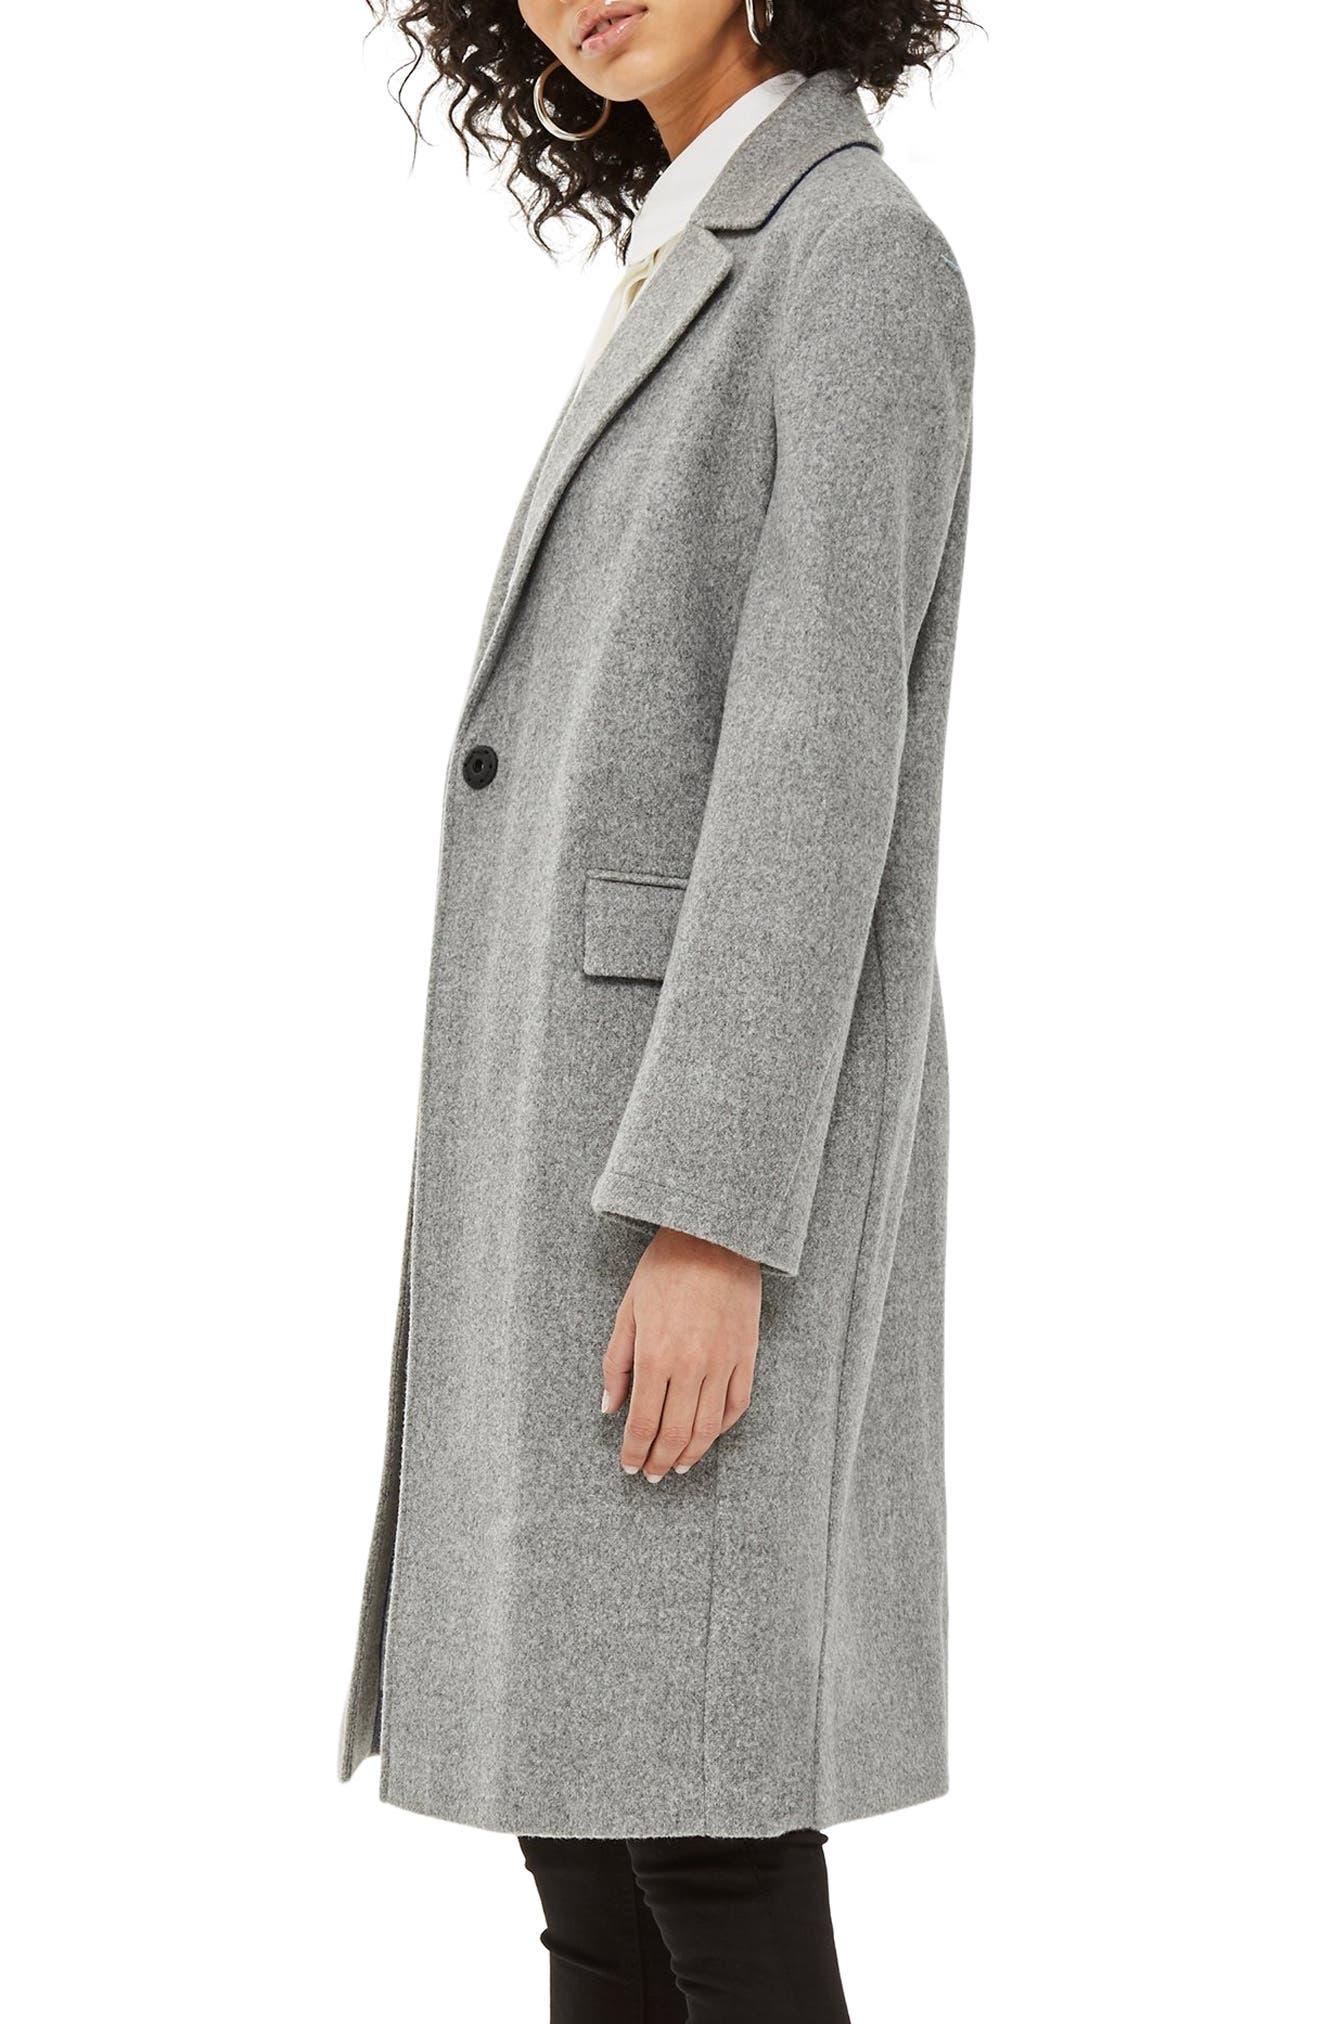 Lily Knit Back Midi Coat,                             Alternate thumbnail 3, color,                             GREY MARL